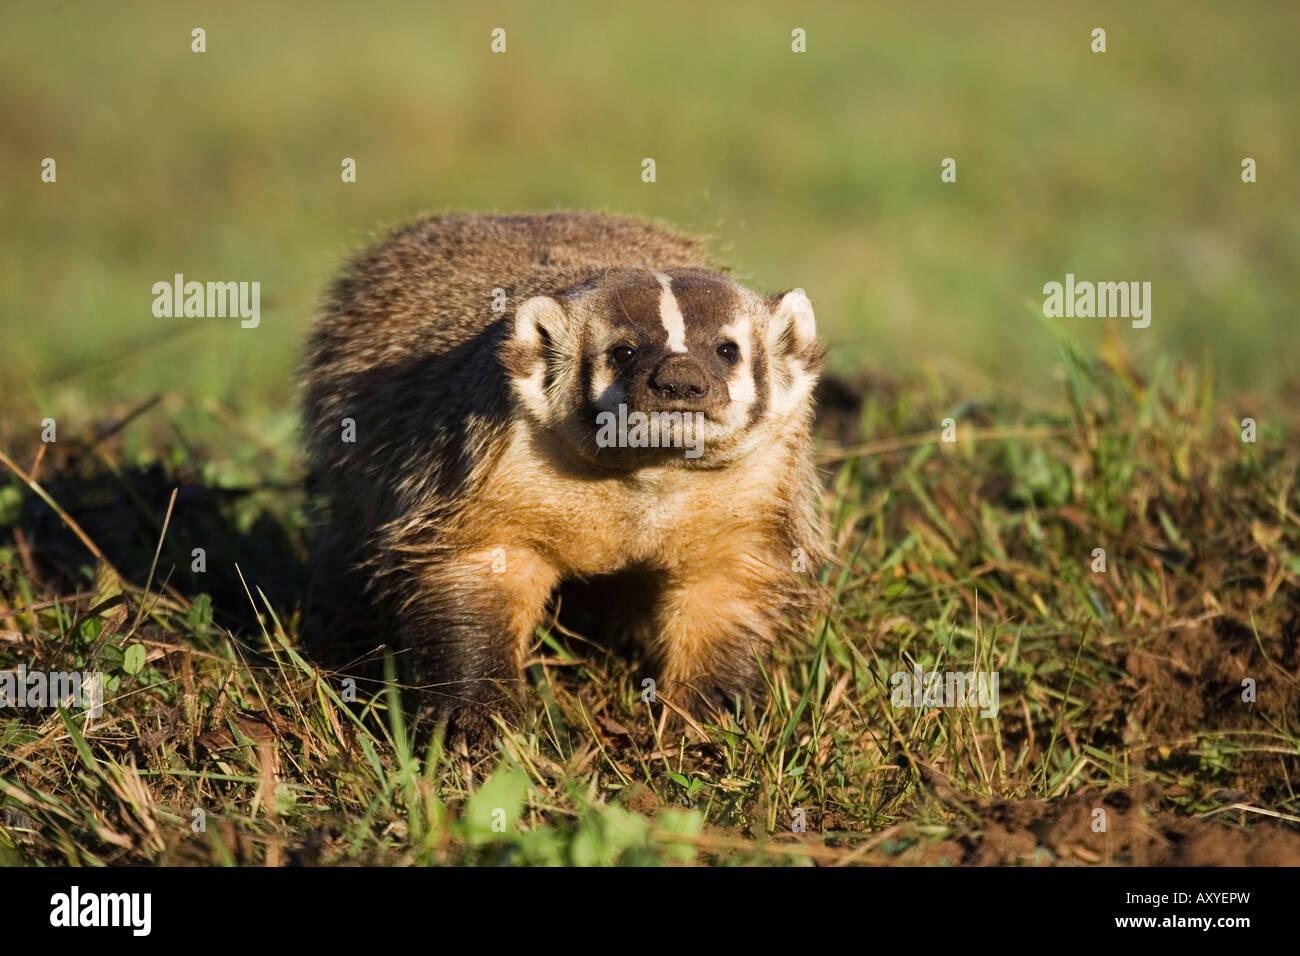 (Tejón Taxidea Taxus), en cautividad, Minnesota Wildlife Connection, arenisca, Minnesota, EE.UU., América Imagen De Stock